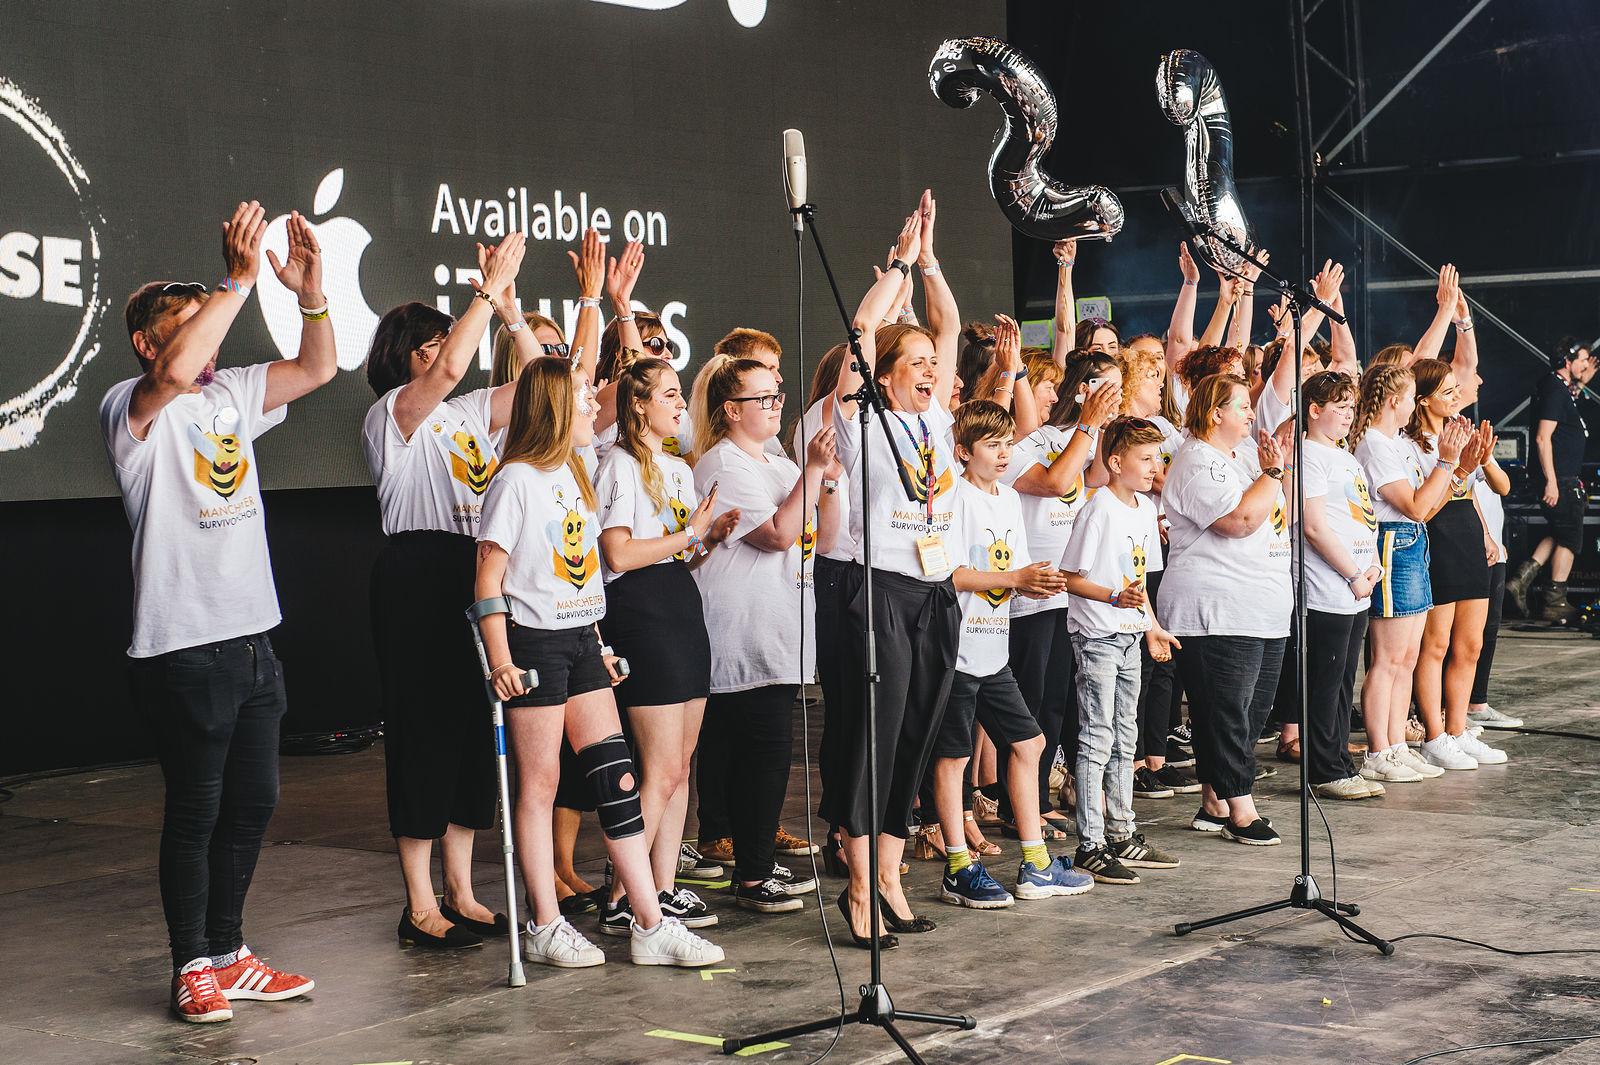 Manchester Survivor's Choir